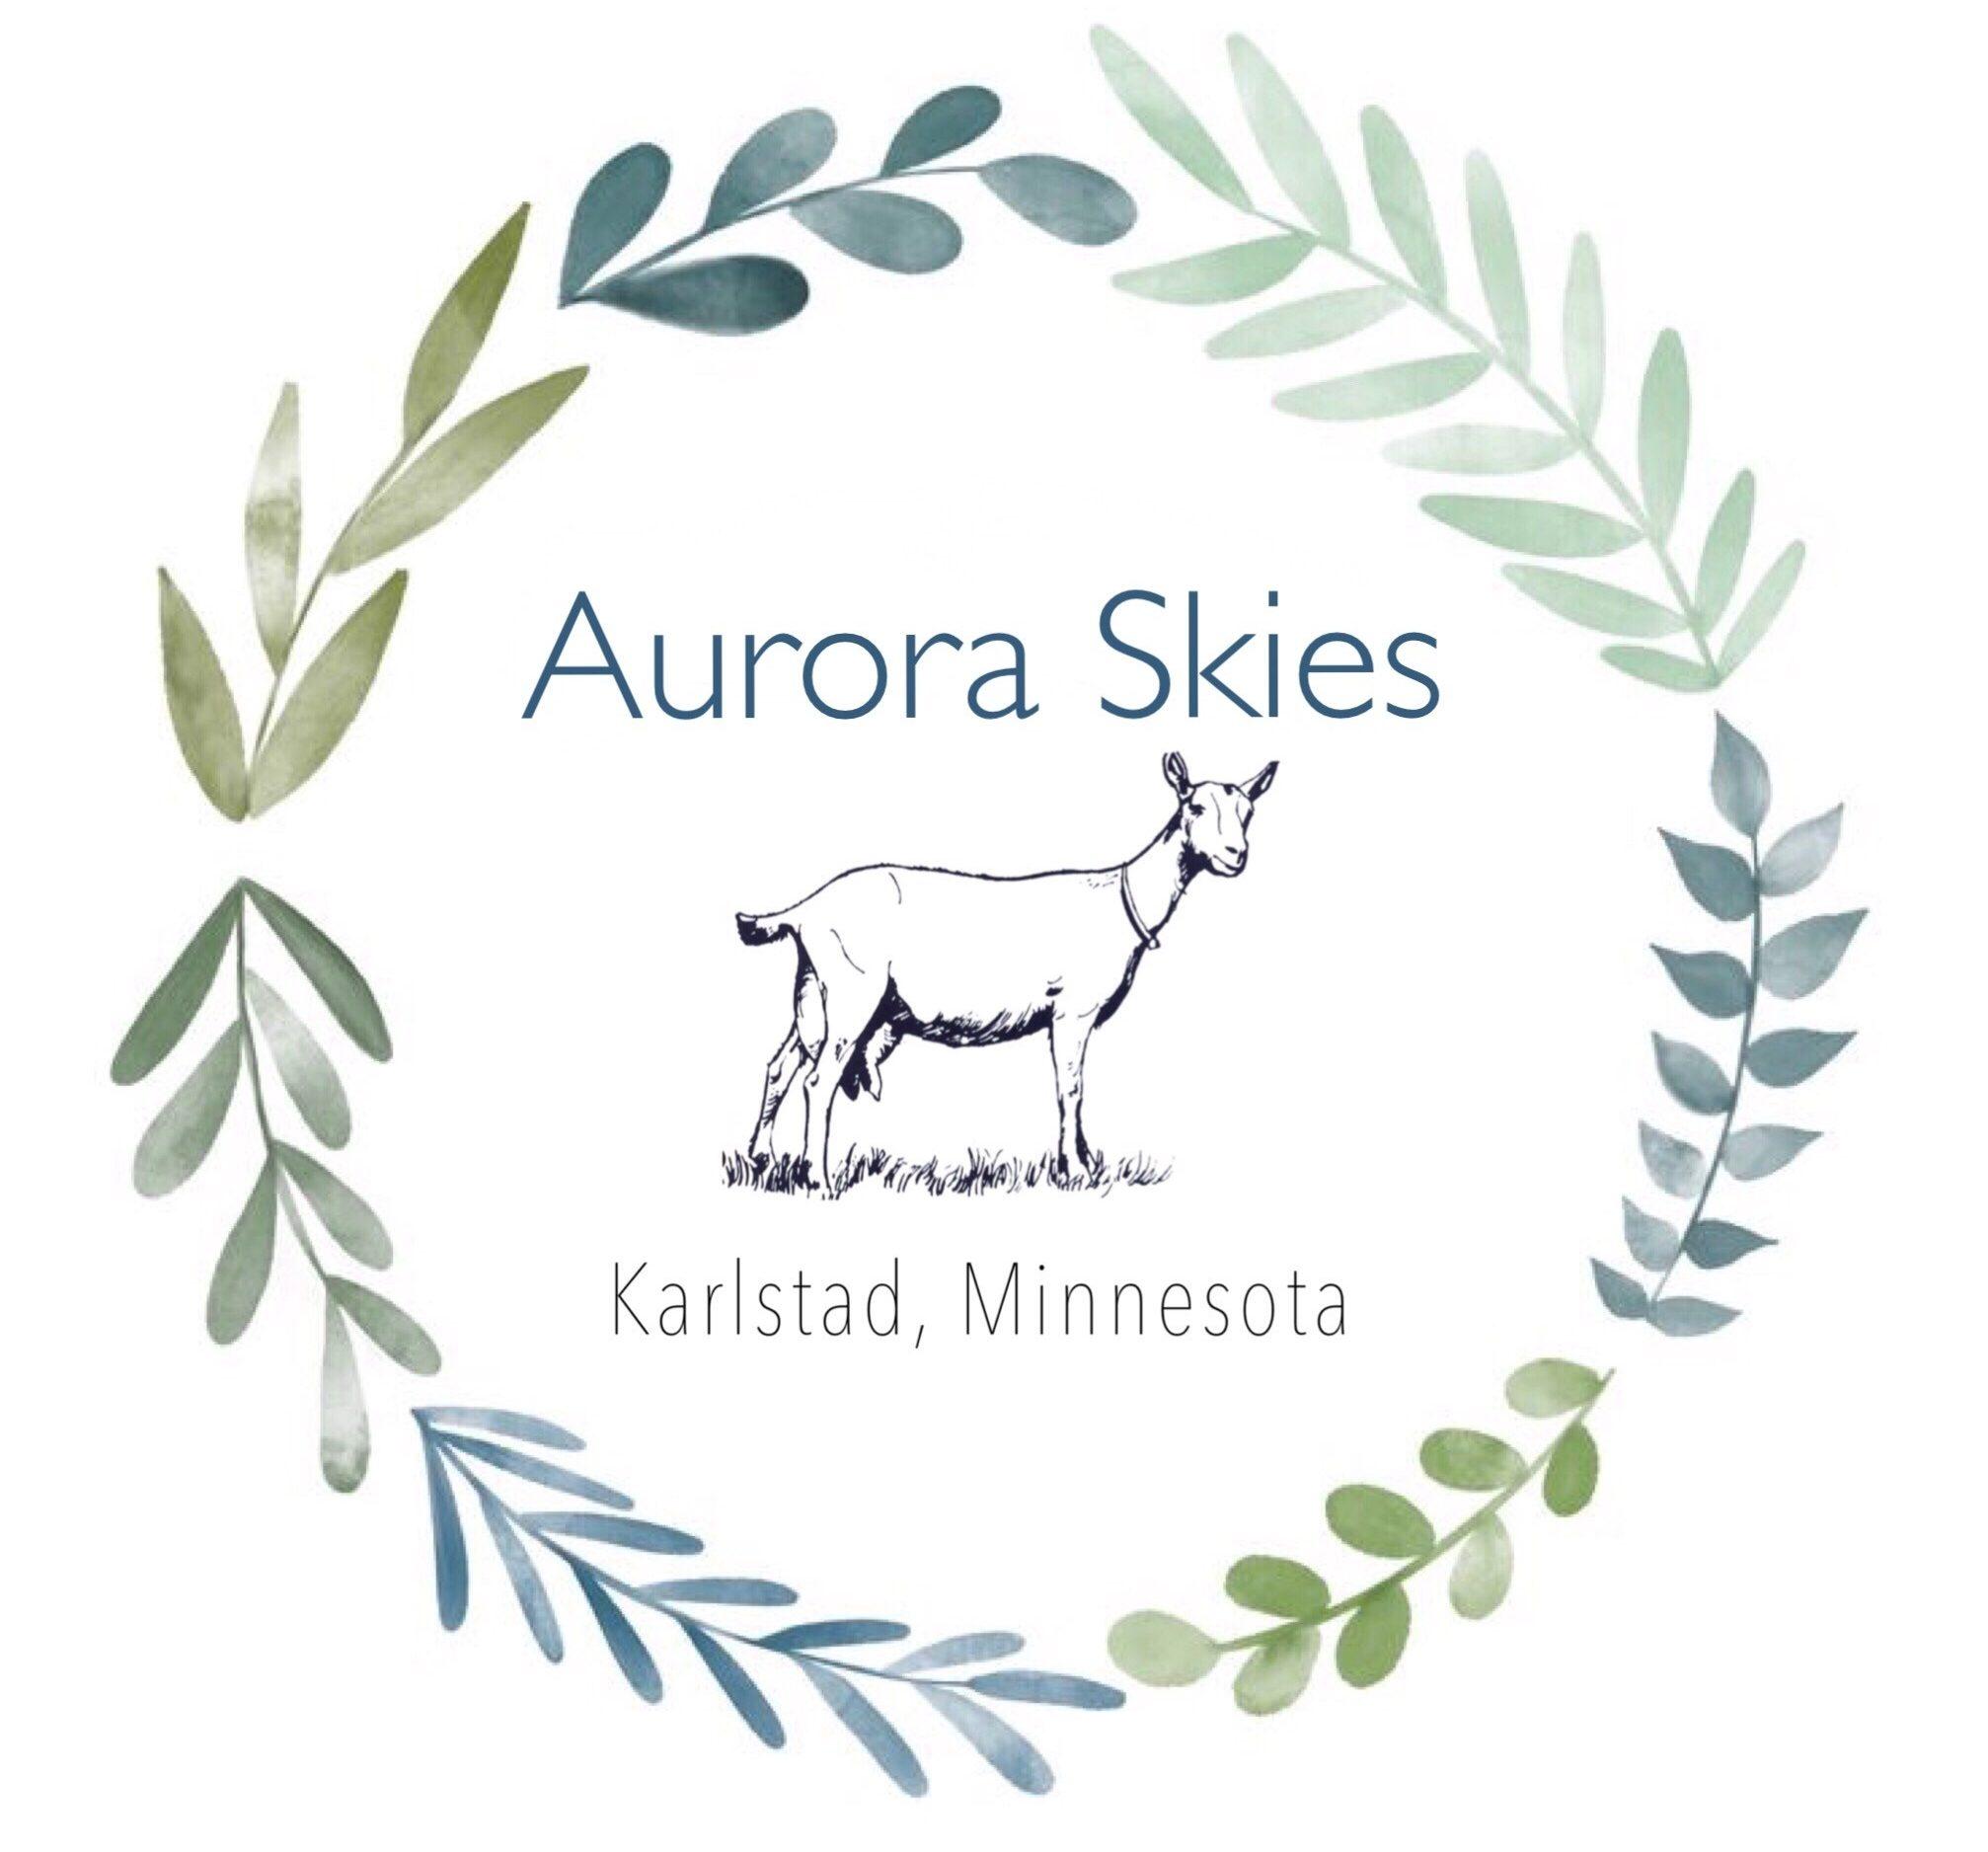 Aurora Skies Farm